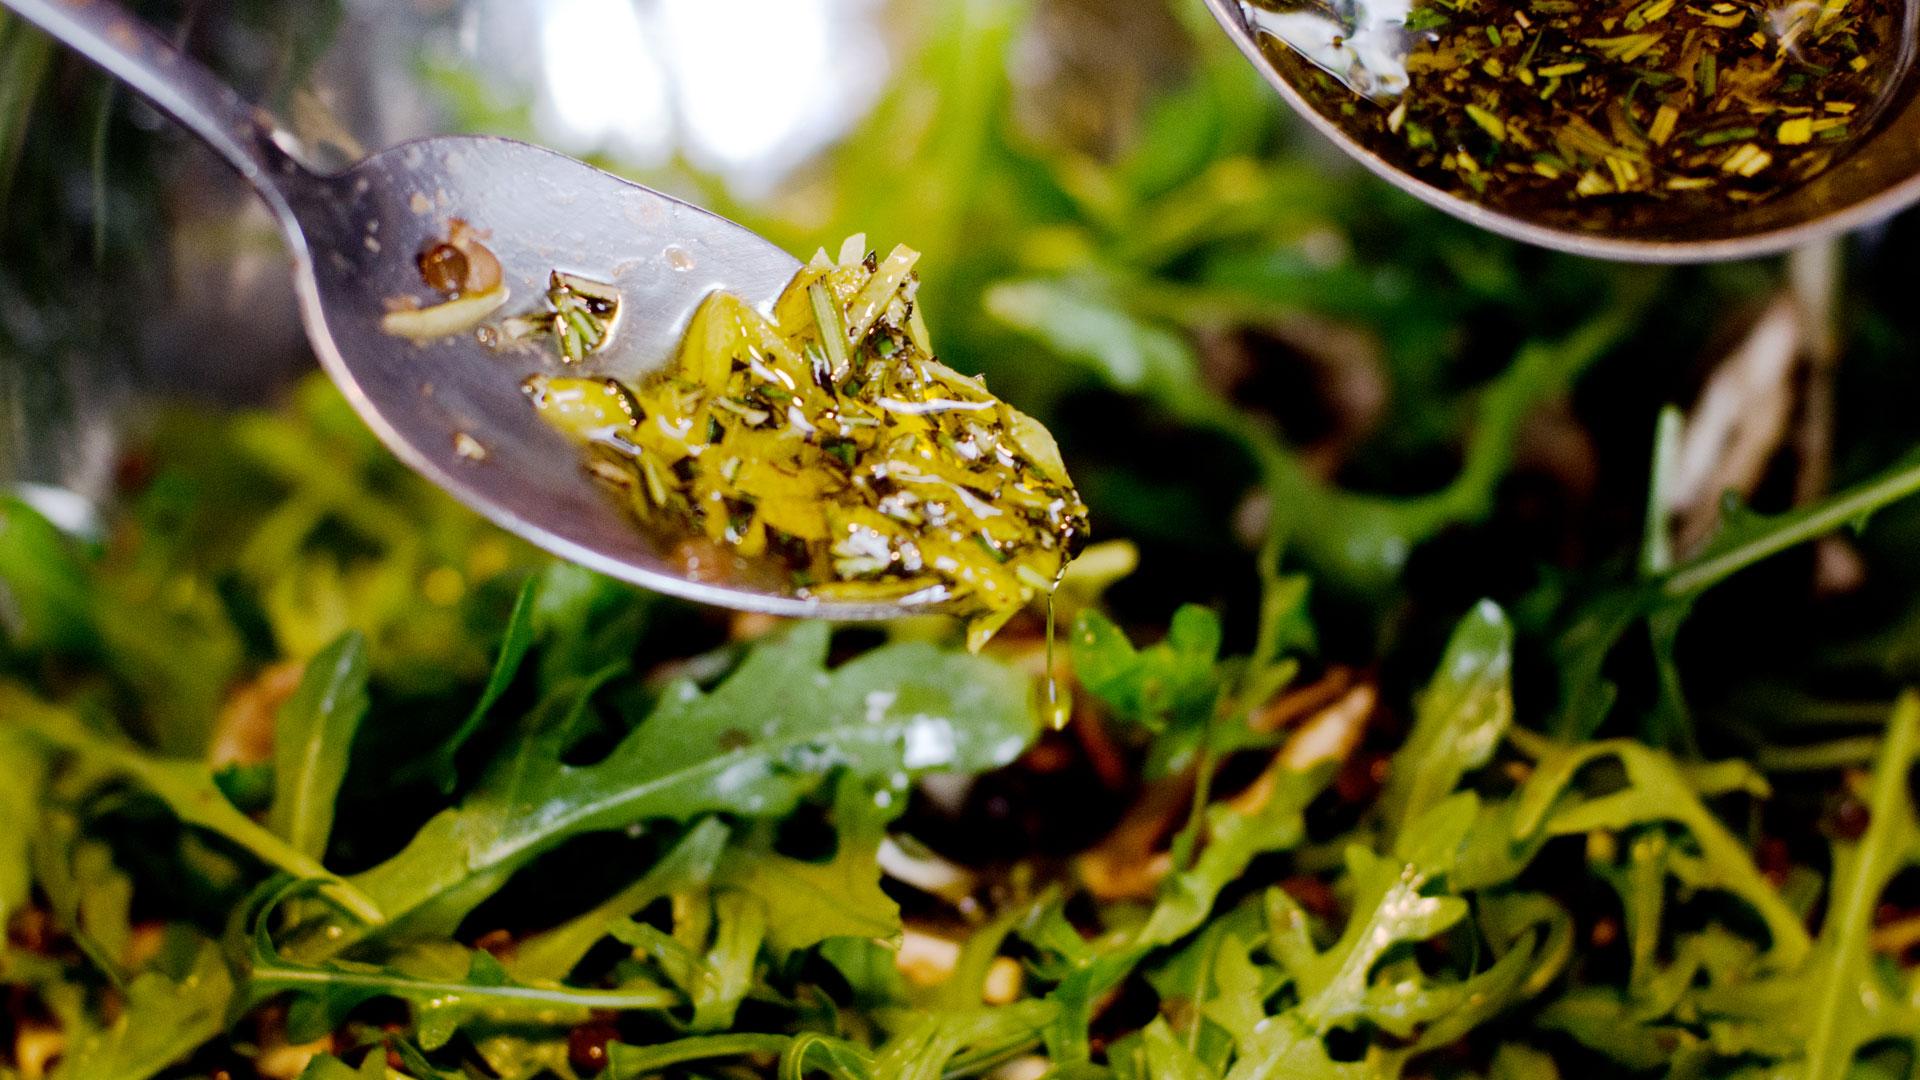 Alastair-prepares-vegan-gluten-free-lemon-and-rosemary-salad-dressing-Foodadit